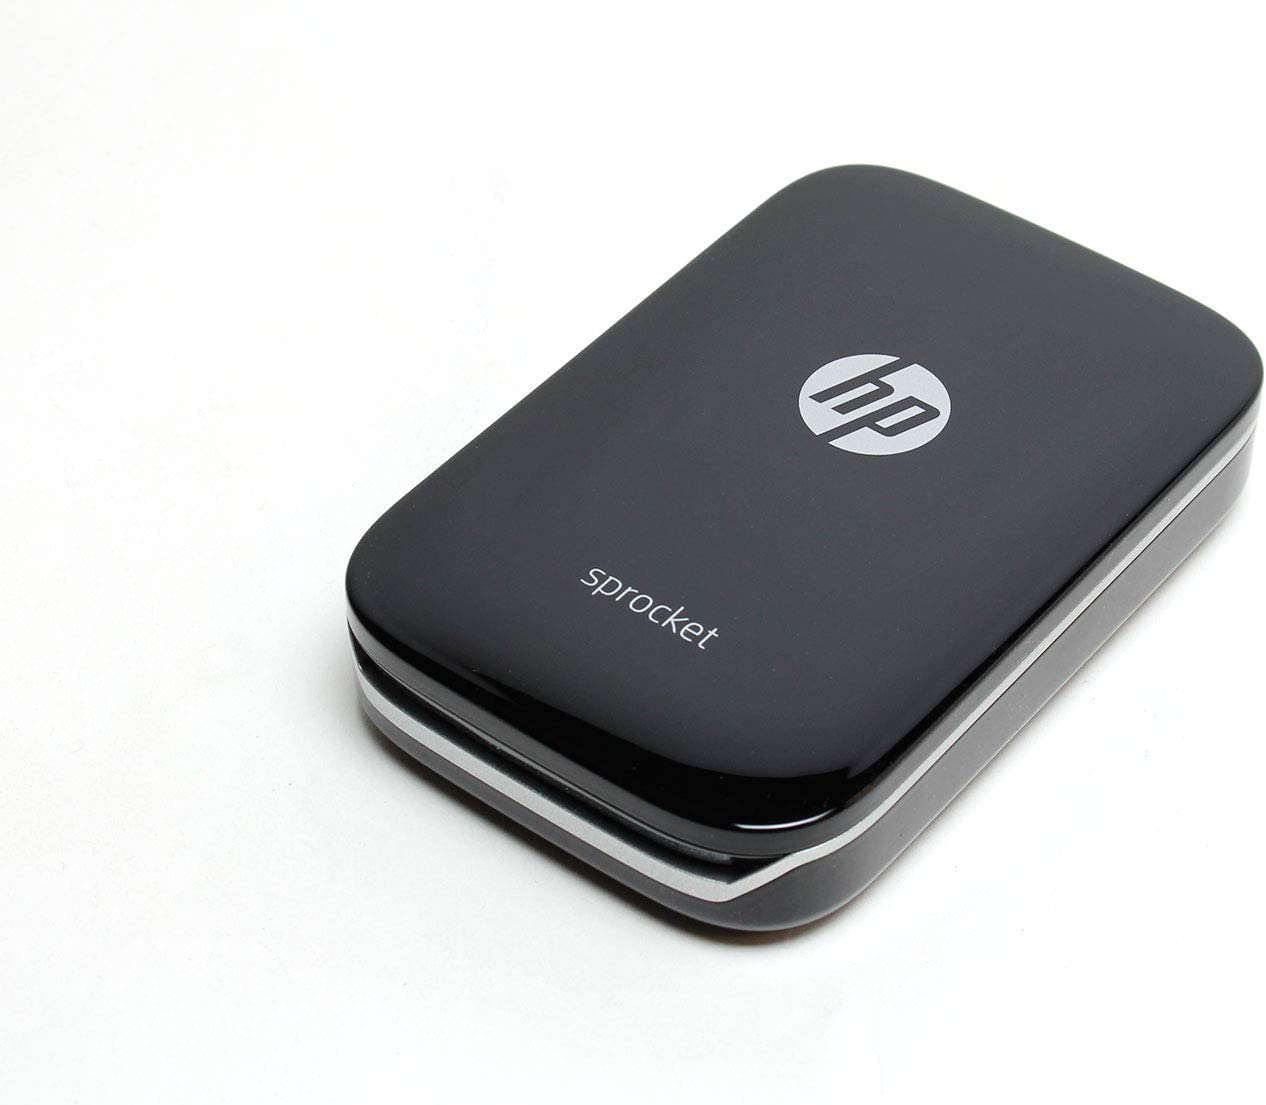 HP Sprocket Portable Photo Printer - Black - X7N08A